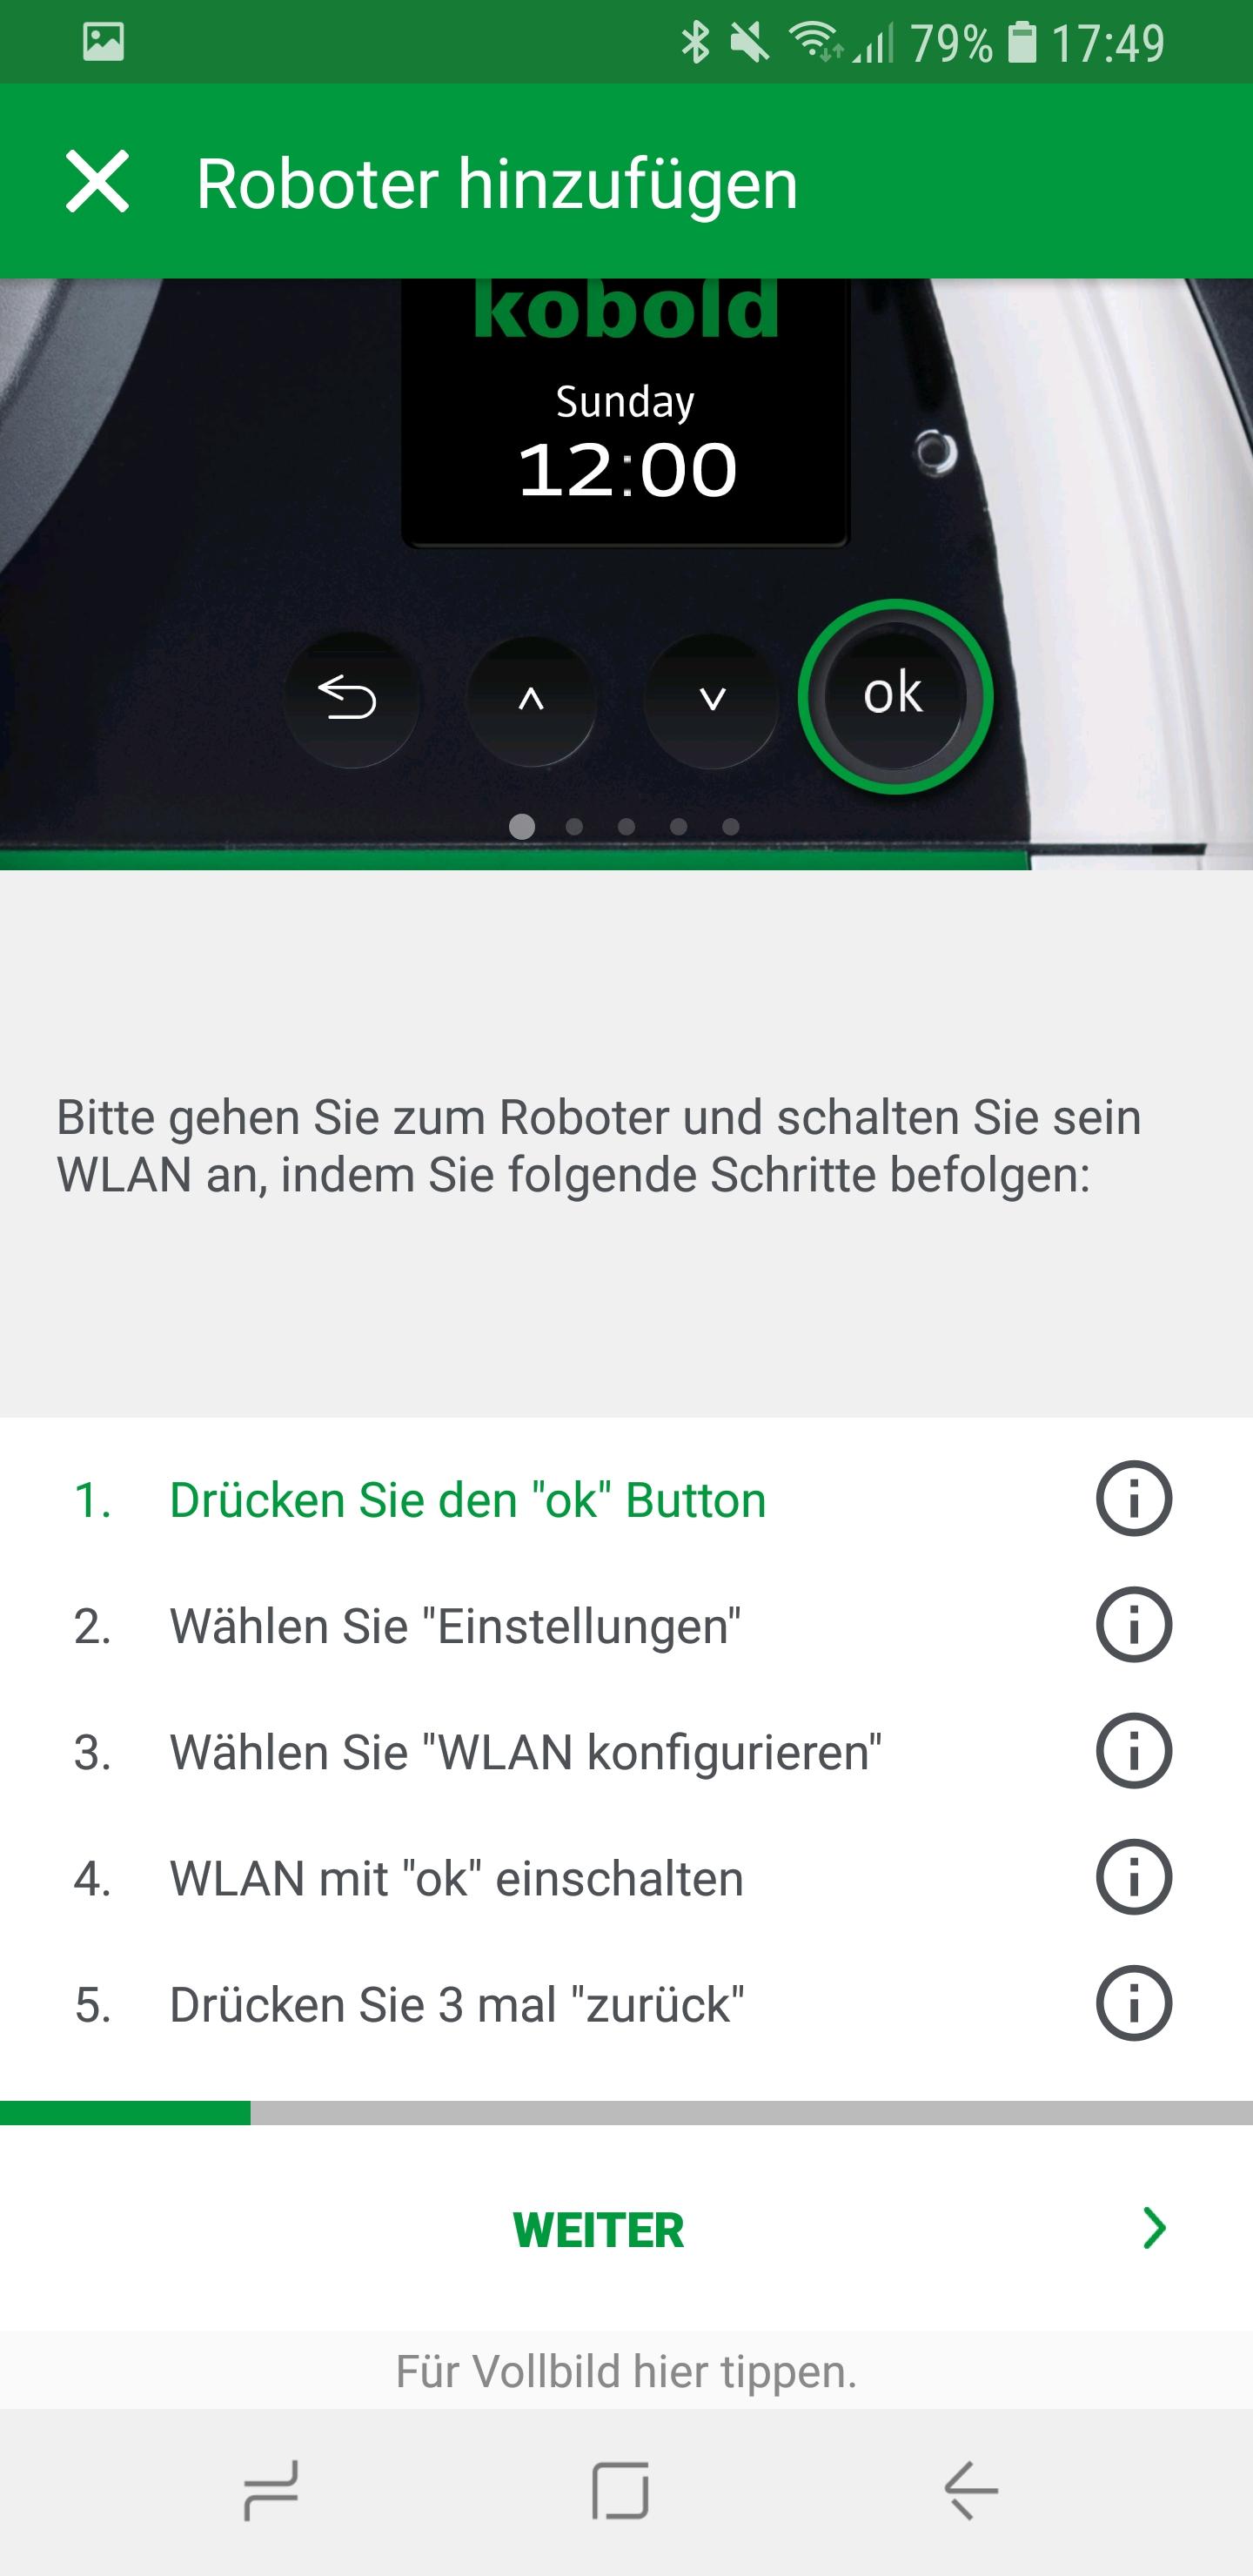 Vorwerk Kobold App Roboter hinzufügen 02